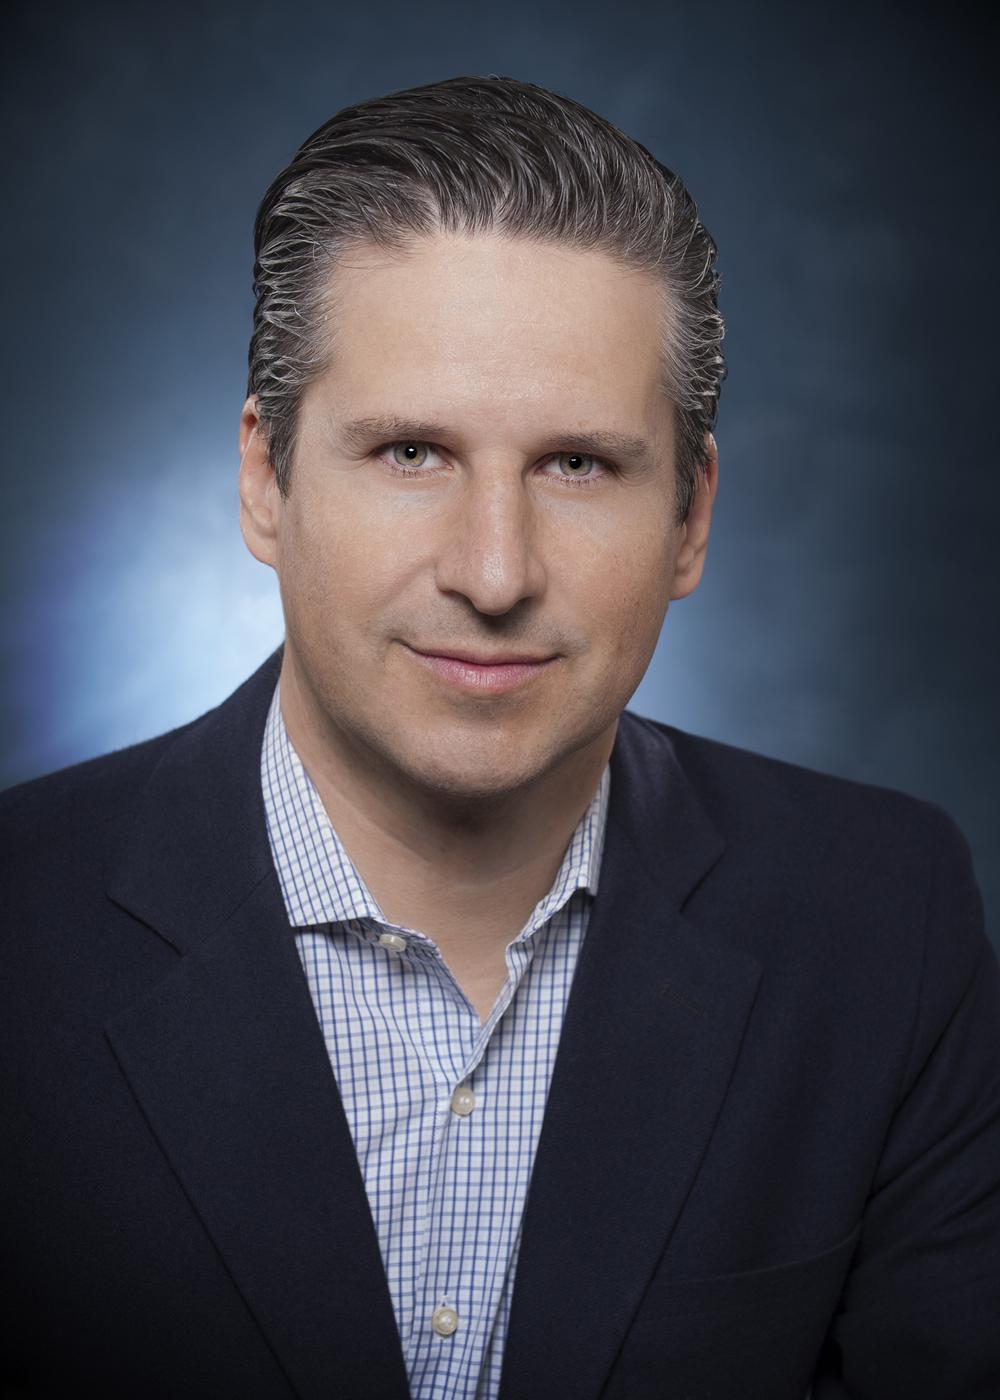 Manuel Gómez Vice-President of Sustainability, Walmart Stores Inc.